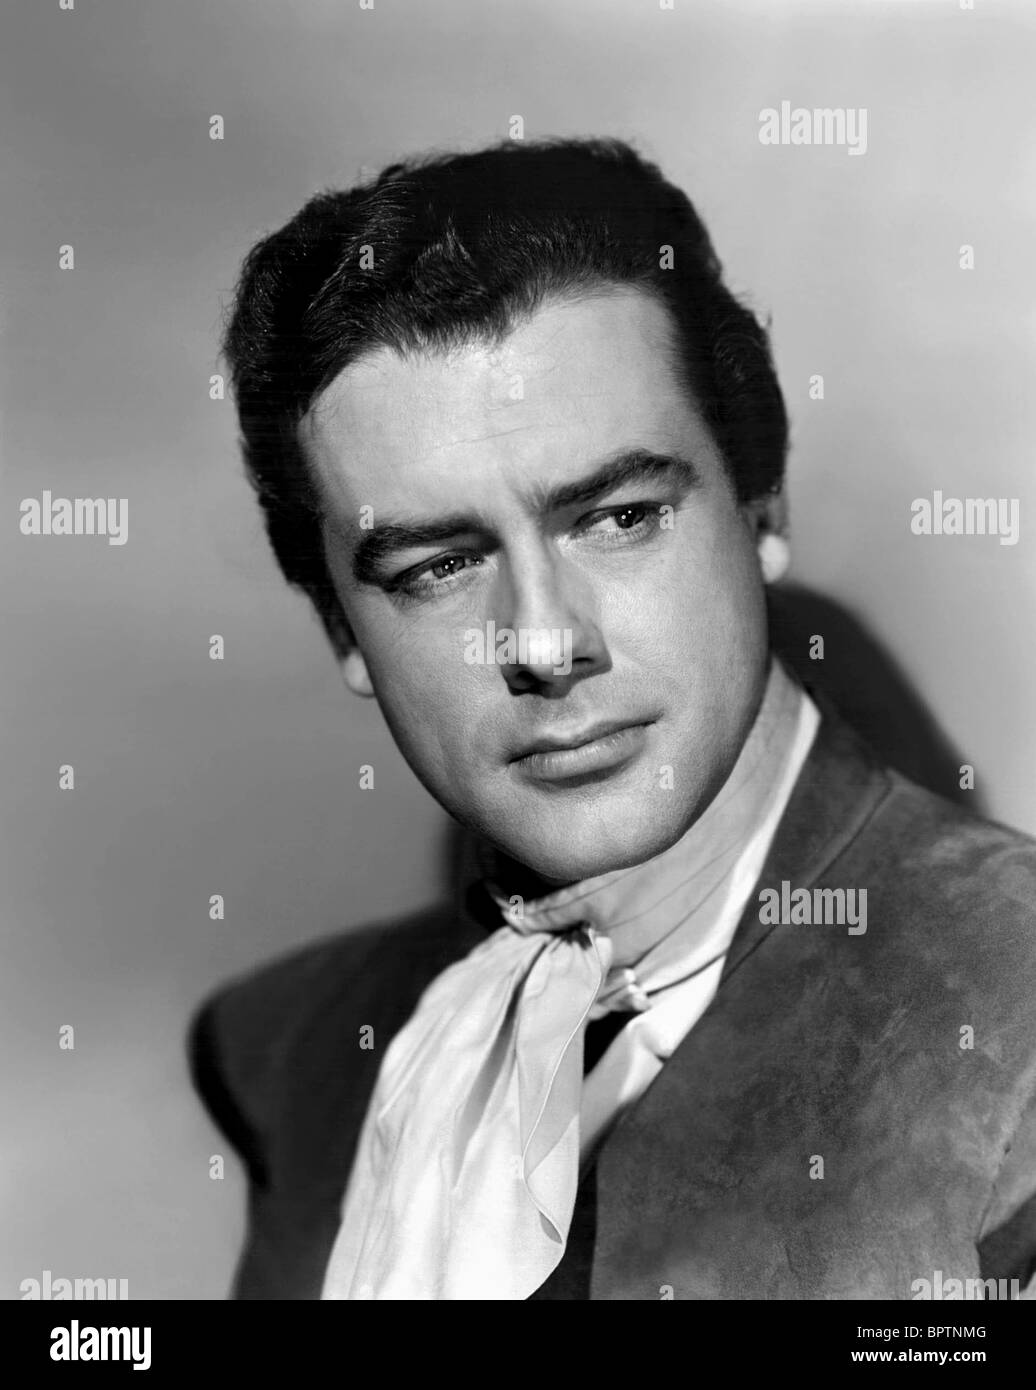 RICHARD GREENE ACTOR (1956) - Stock Image